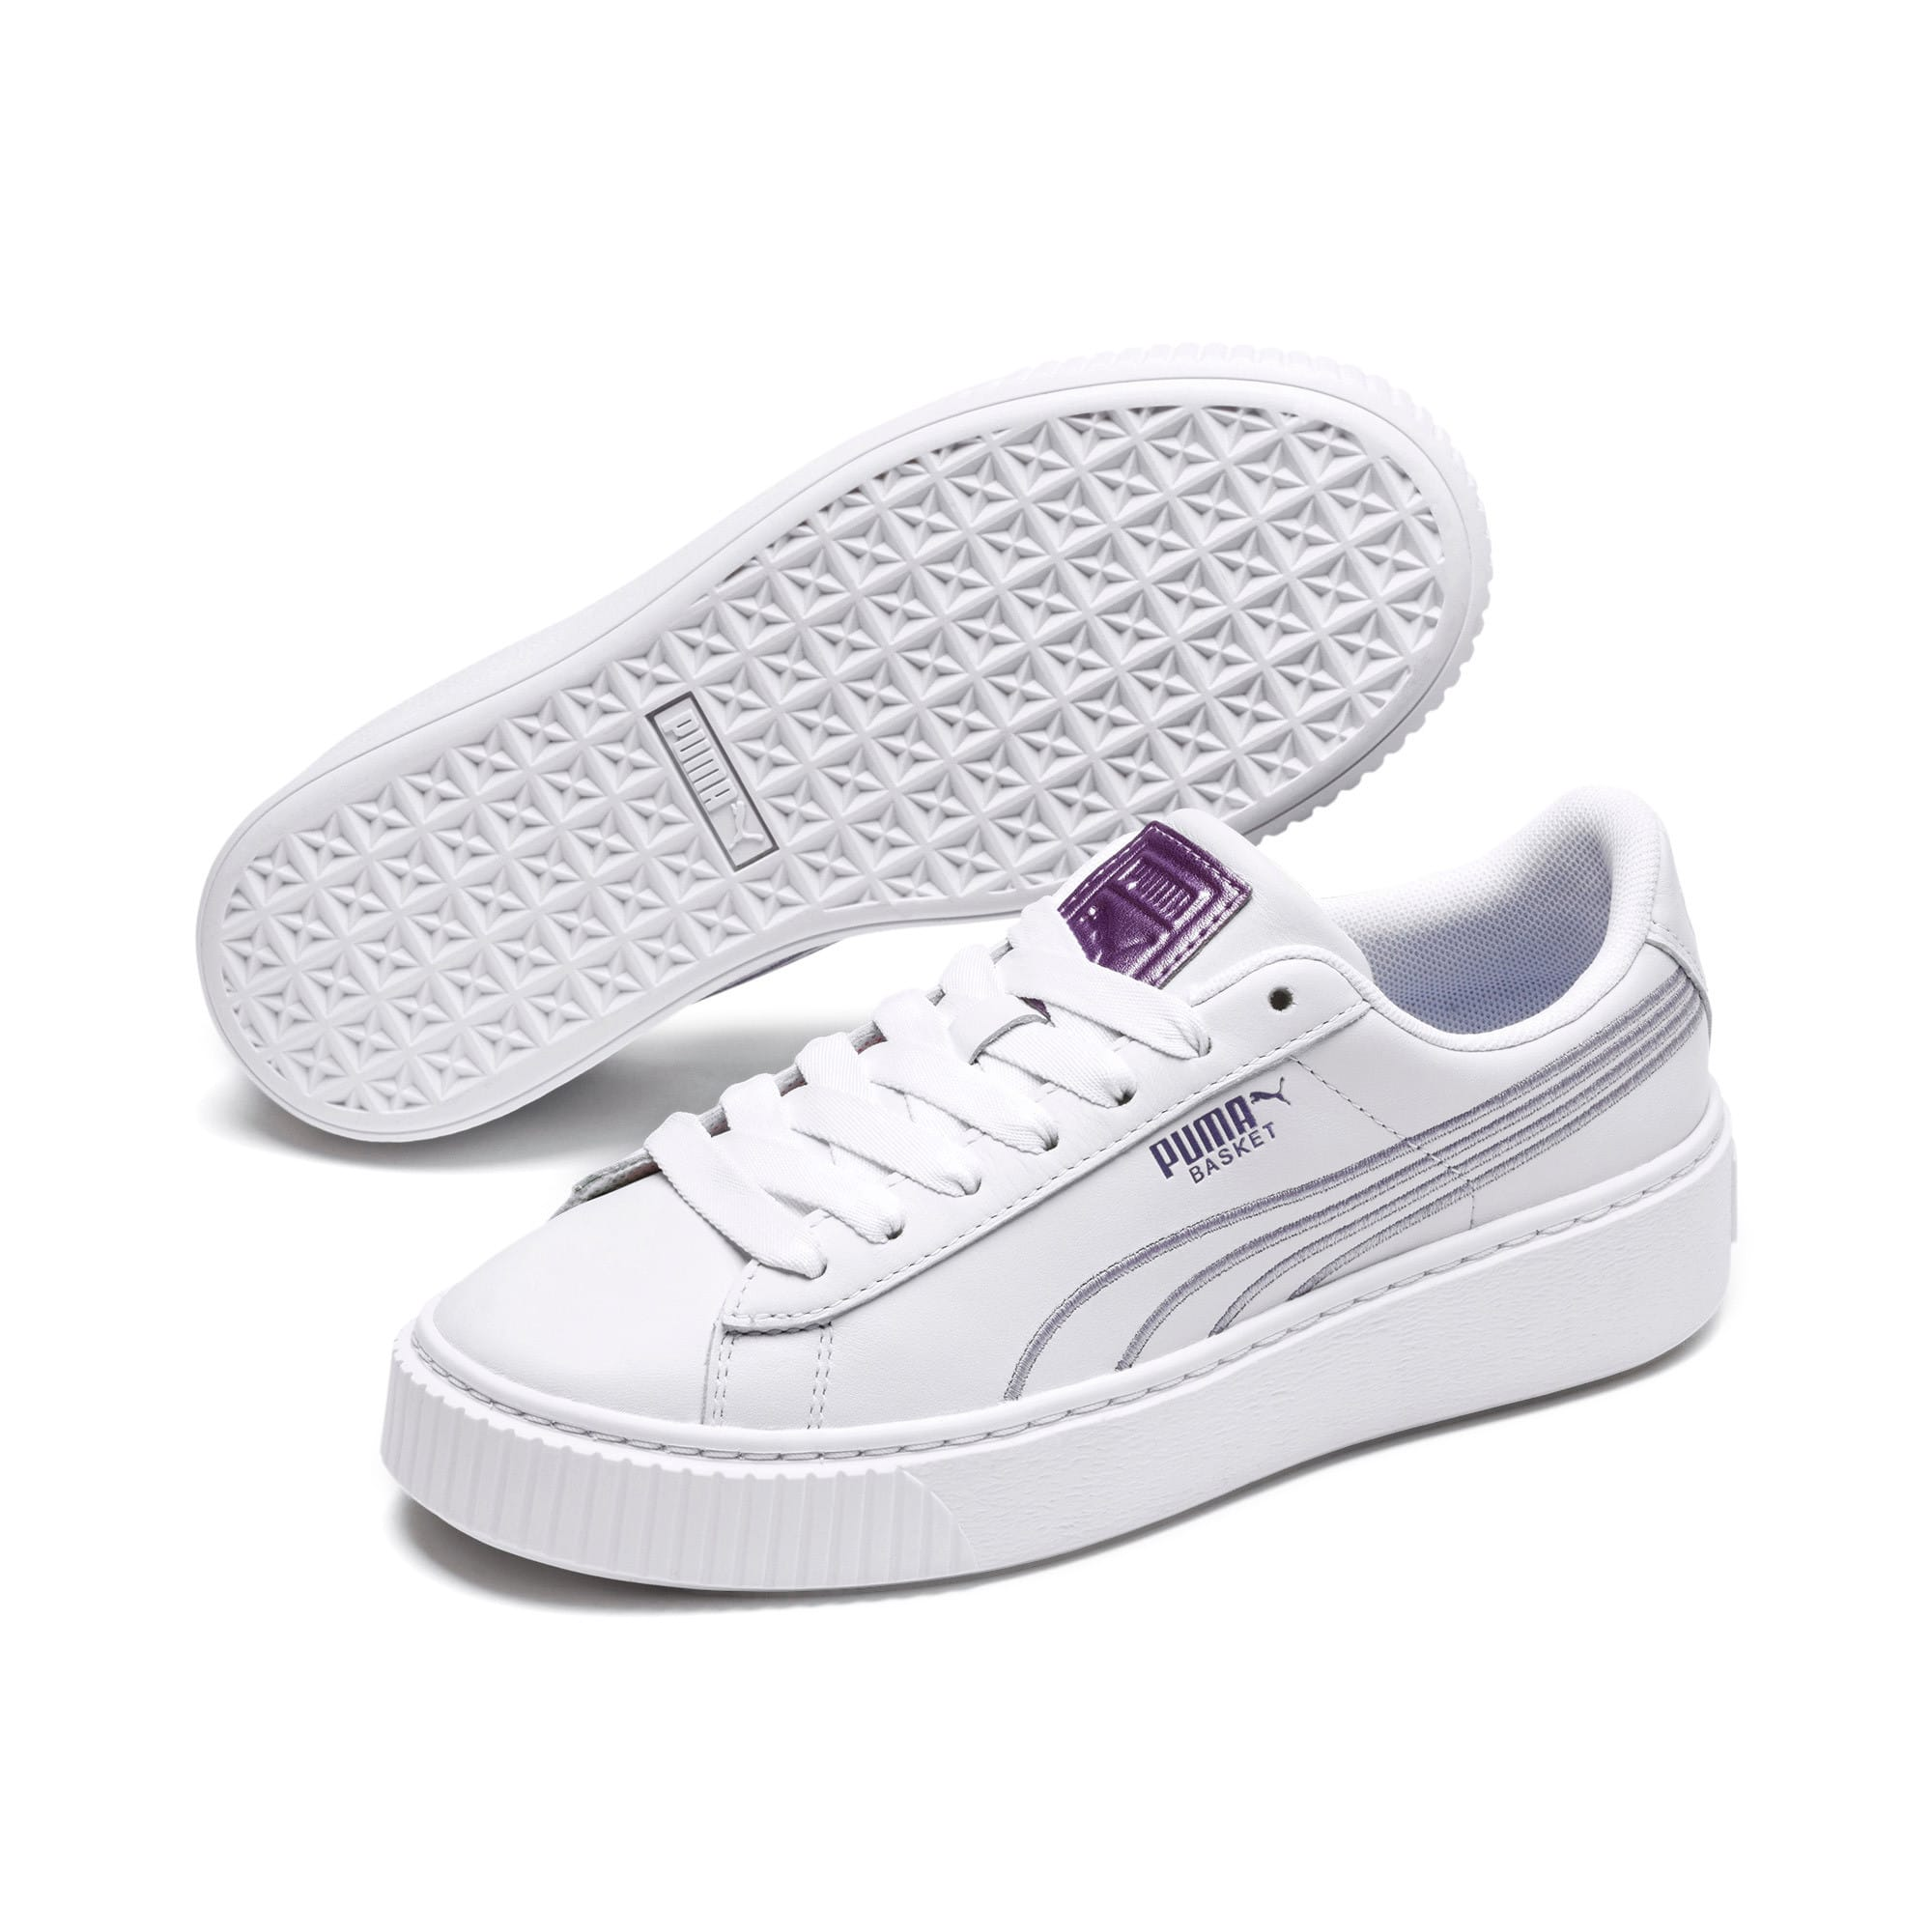 puma basket platform core white & gum shoes NWT